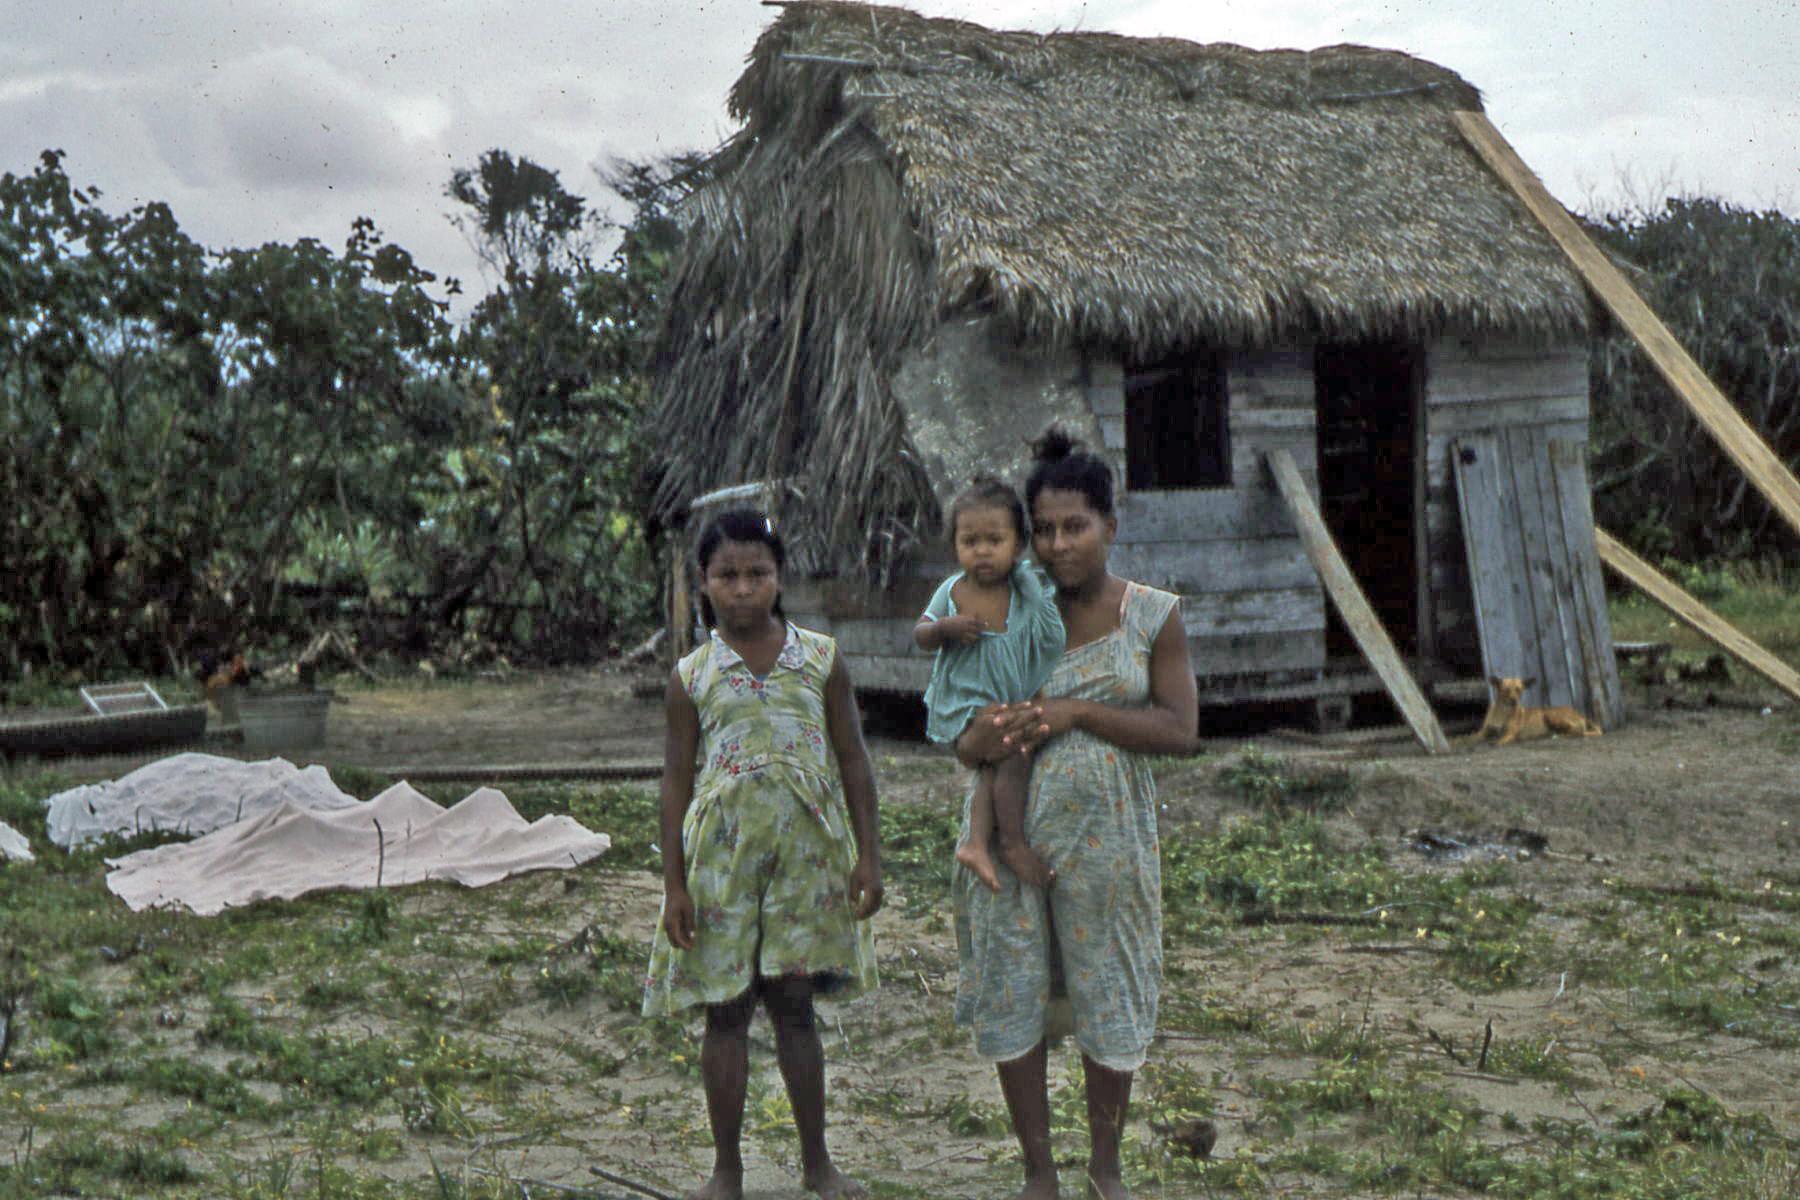 https://upload.wikimedia.org/wikipedia/commons/0/0c/Family_of_Miskito_people_along_the_Prinzapolka_river,_Nicaragua_-_c._1957%E2%80%931961.jpg